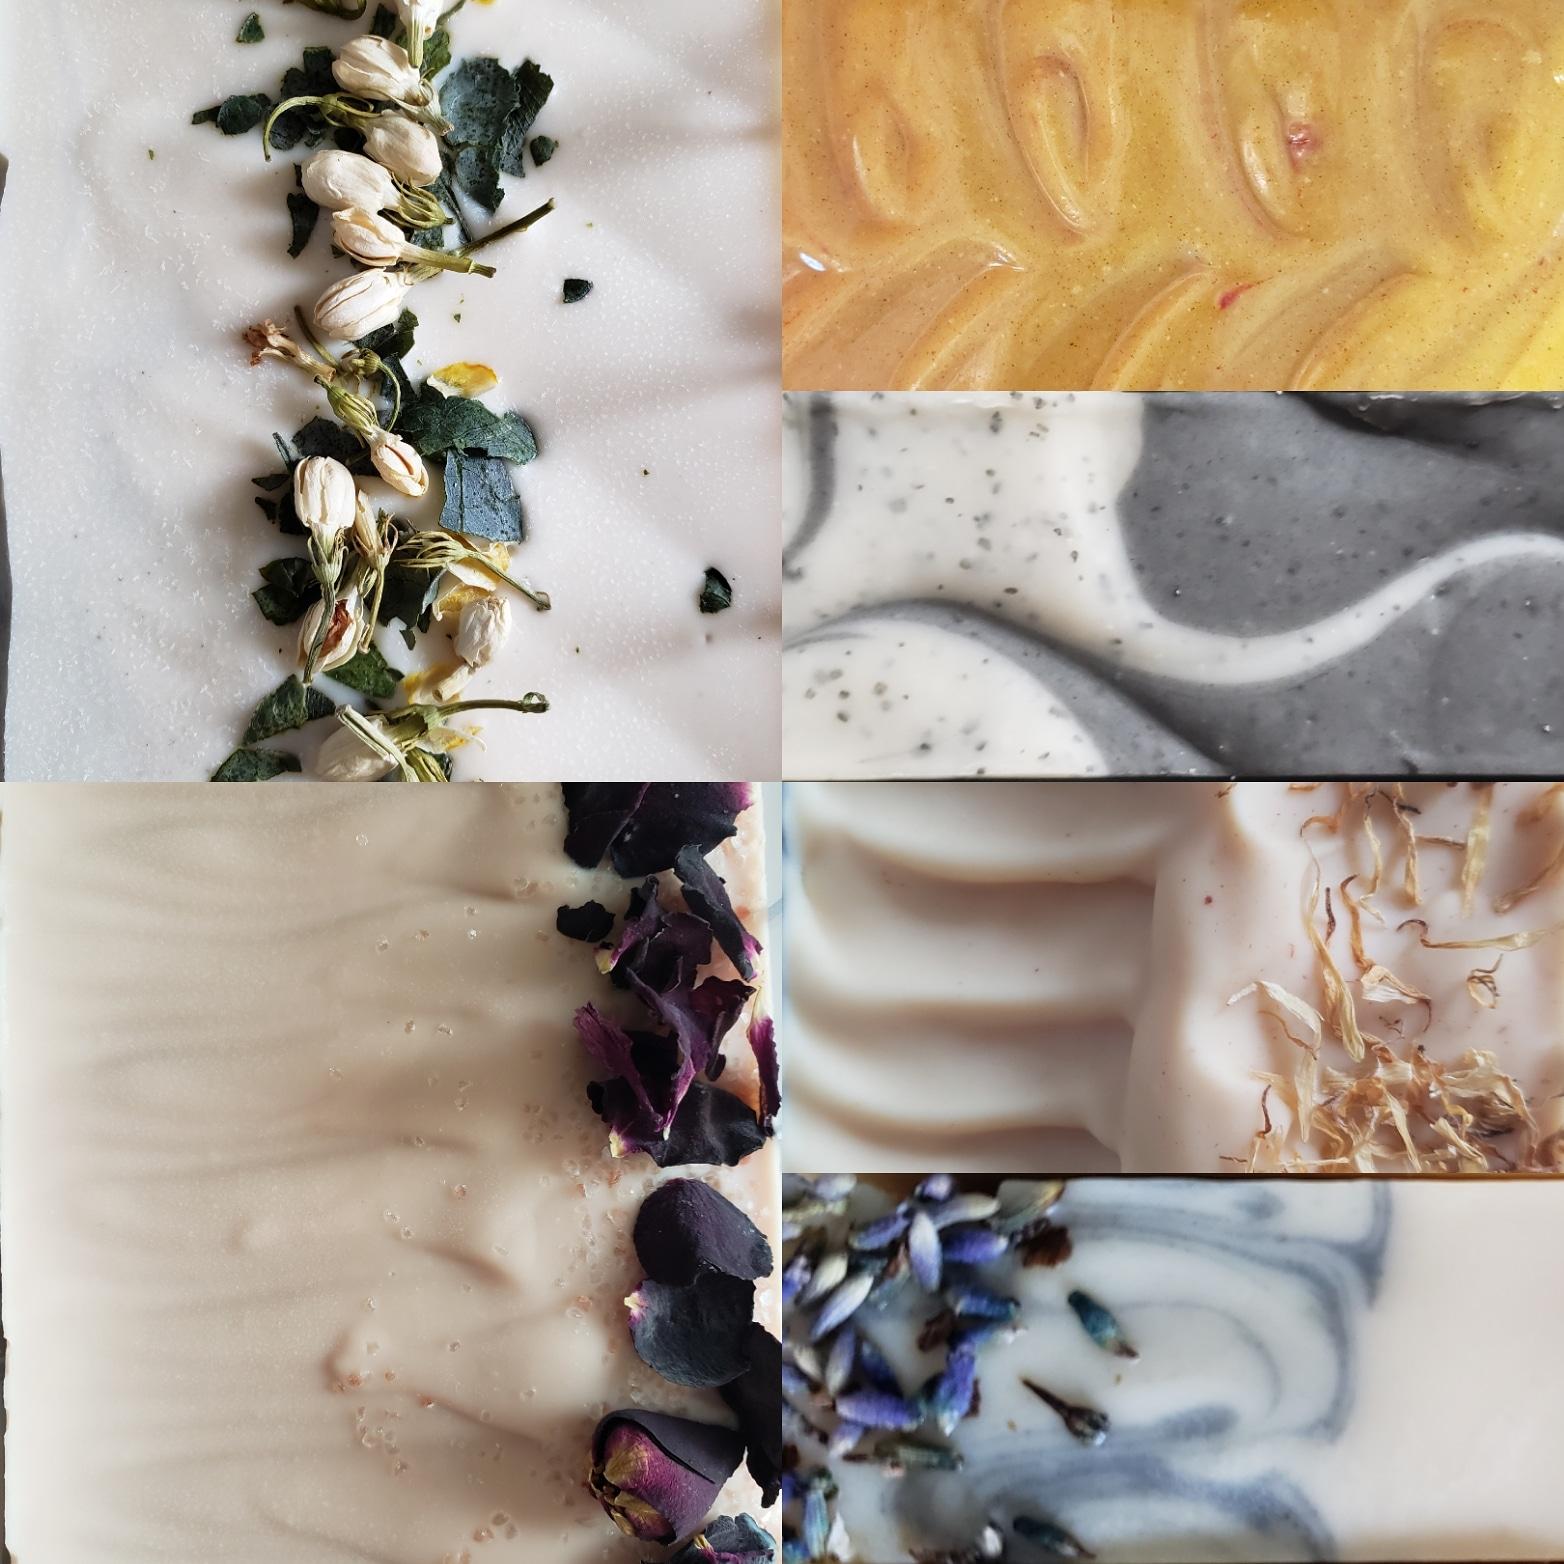 Clockwise from Top Left: Neroli-Lime & Balsam, Lemongrass & Ginger, Star Aniseseed, May Chang Orange, Bulgarian Lavender, and Cardamom (Rose) Geranium.